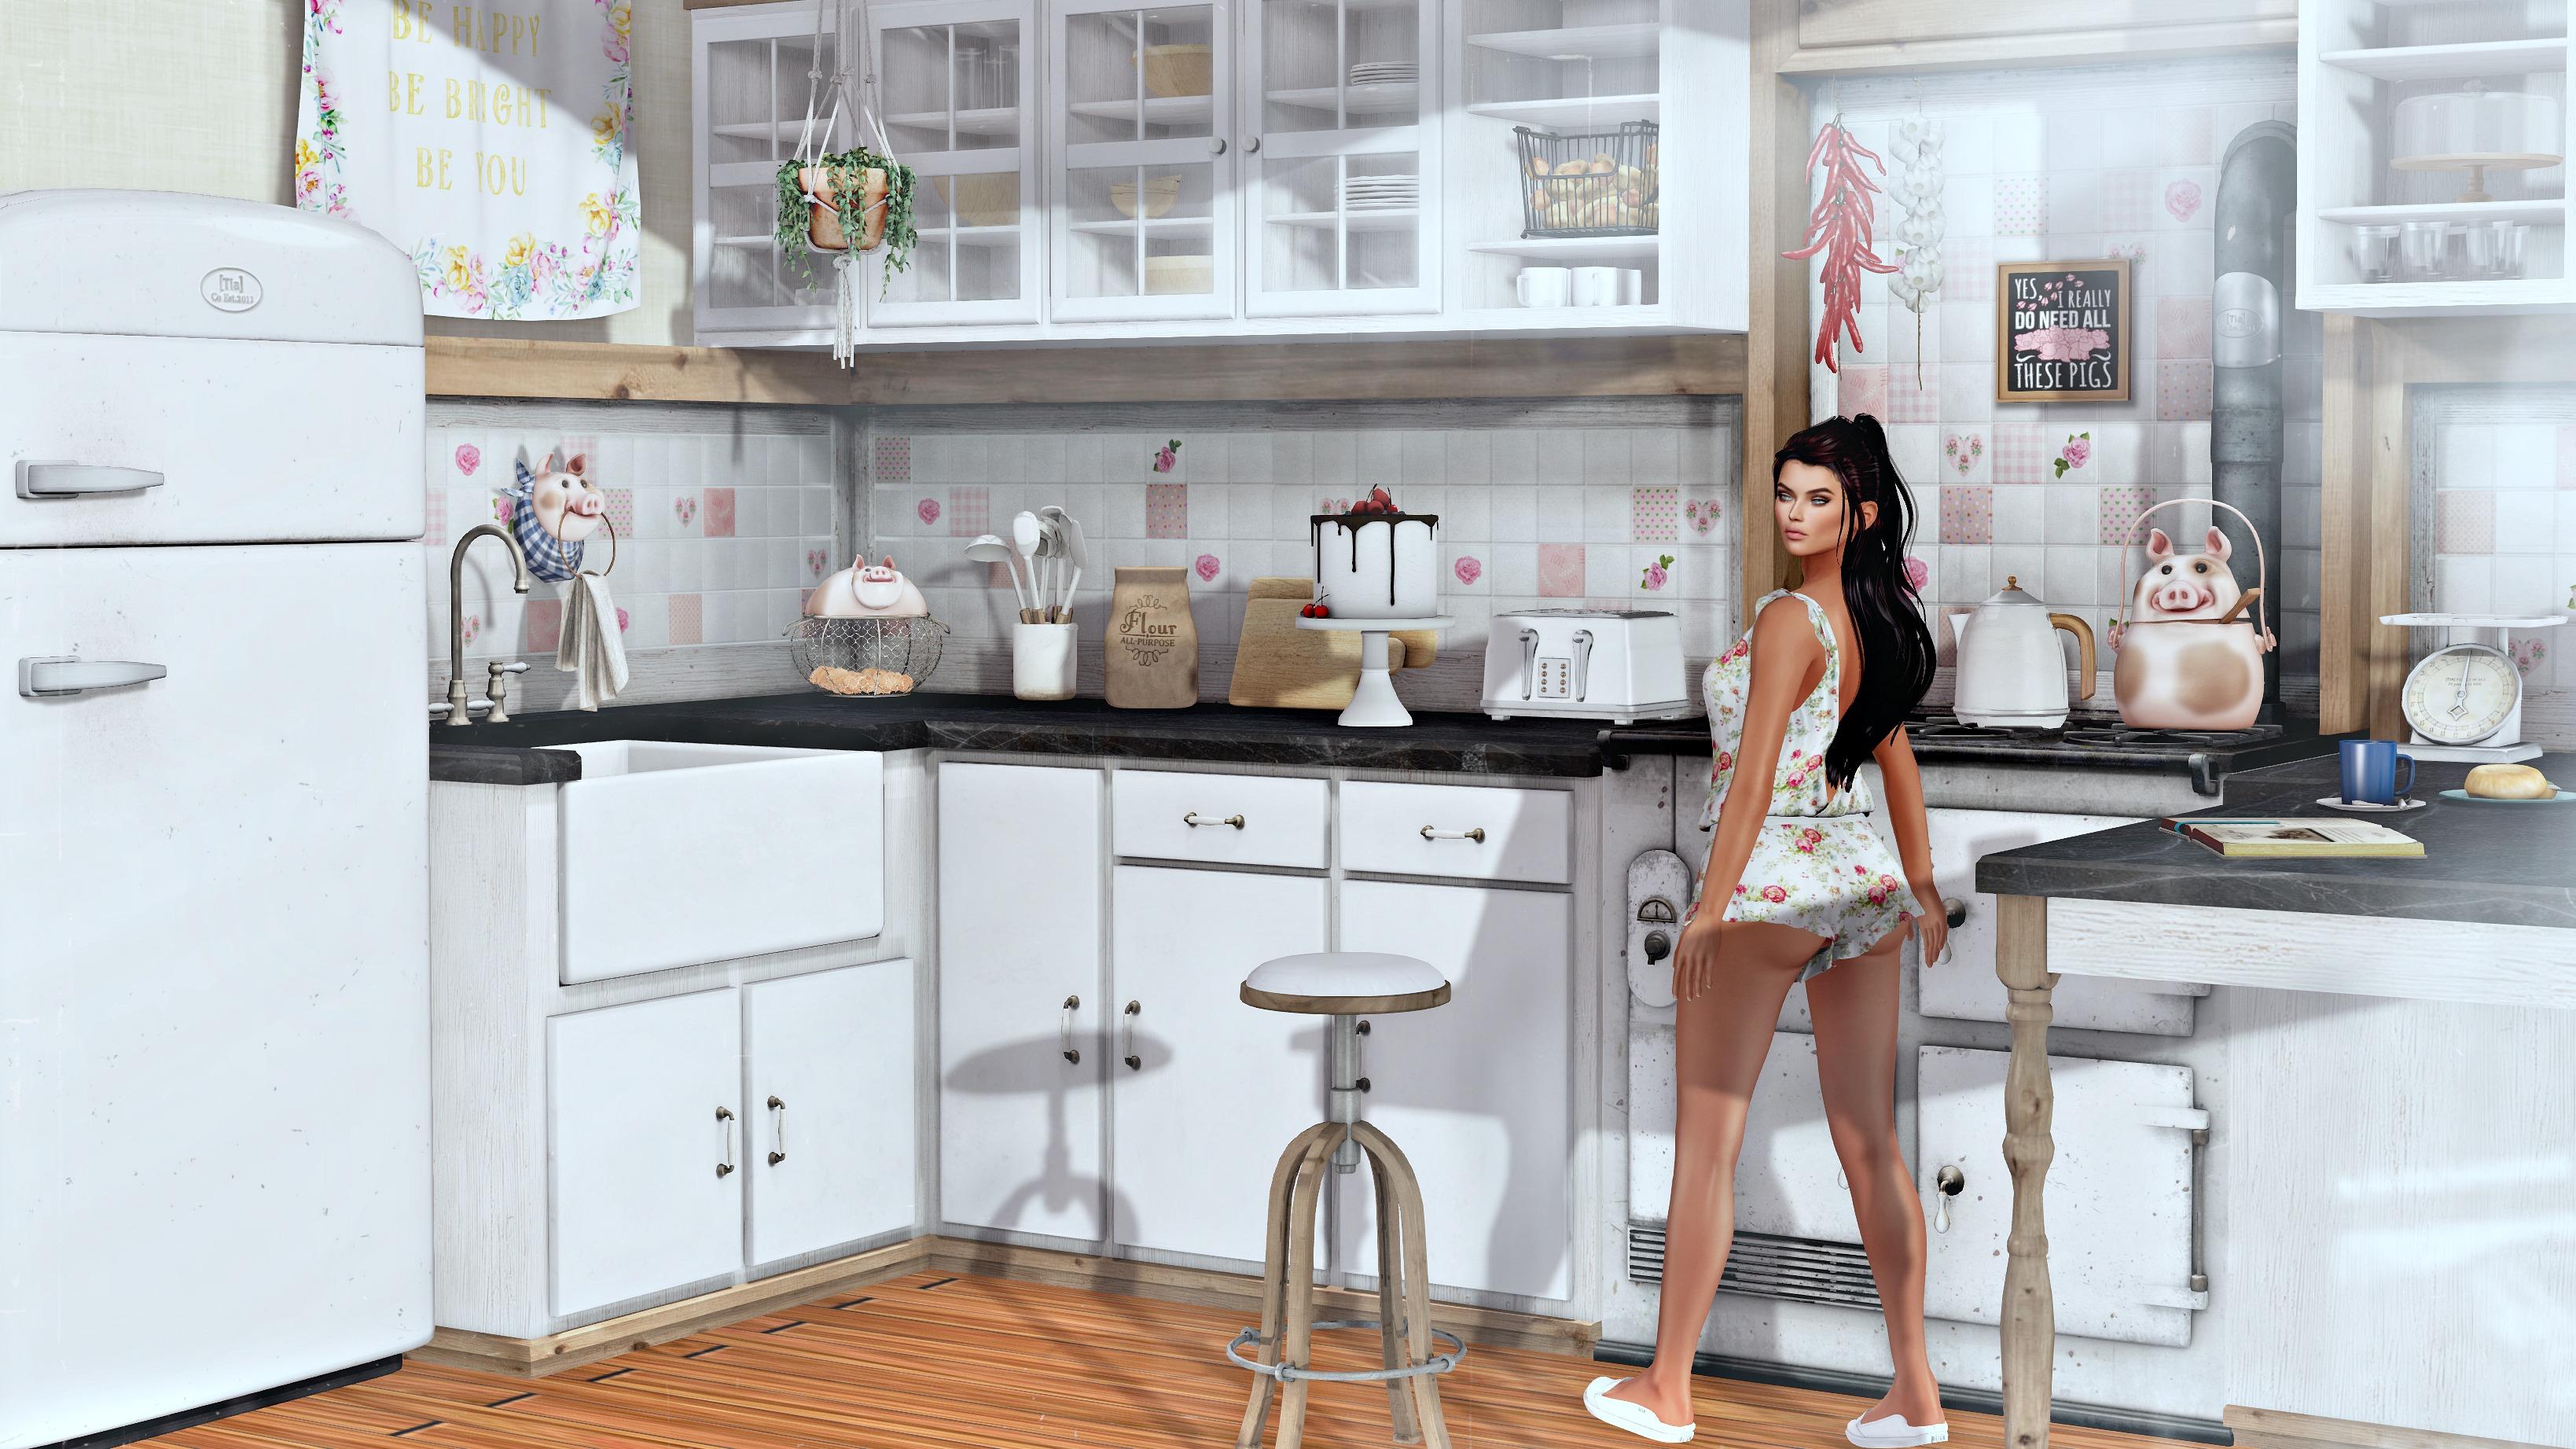 Hintergrundbilder : Menschen, Zimmer, Koch, drinnen, Mode ...